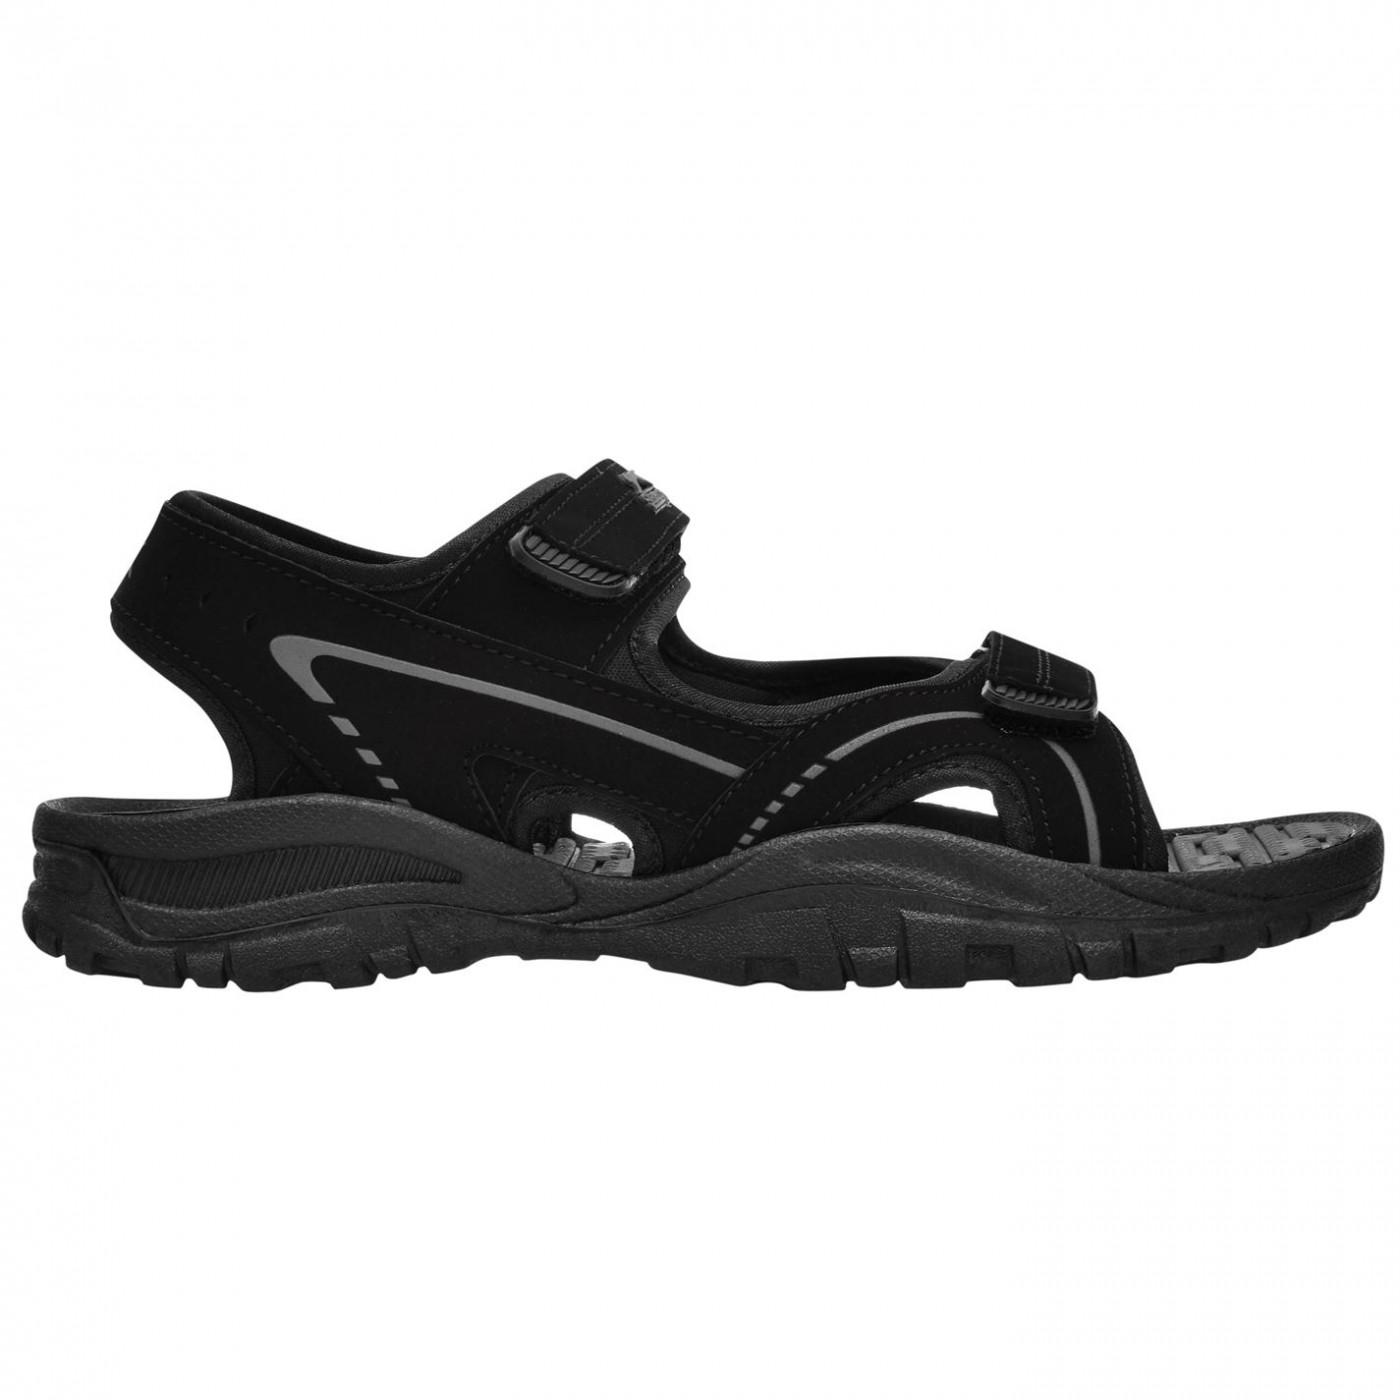 Men's sandals Slazenger Wave